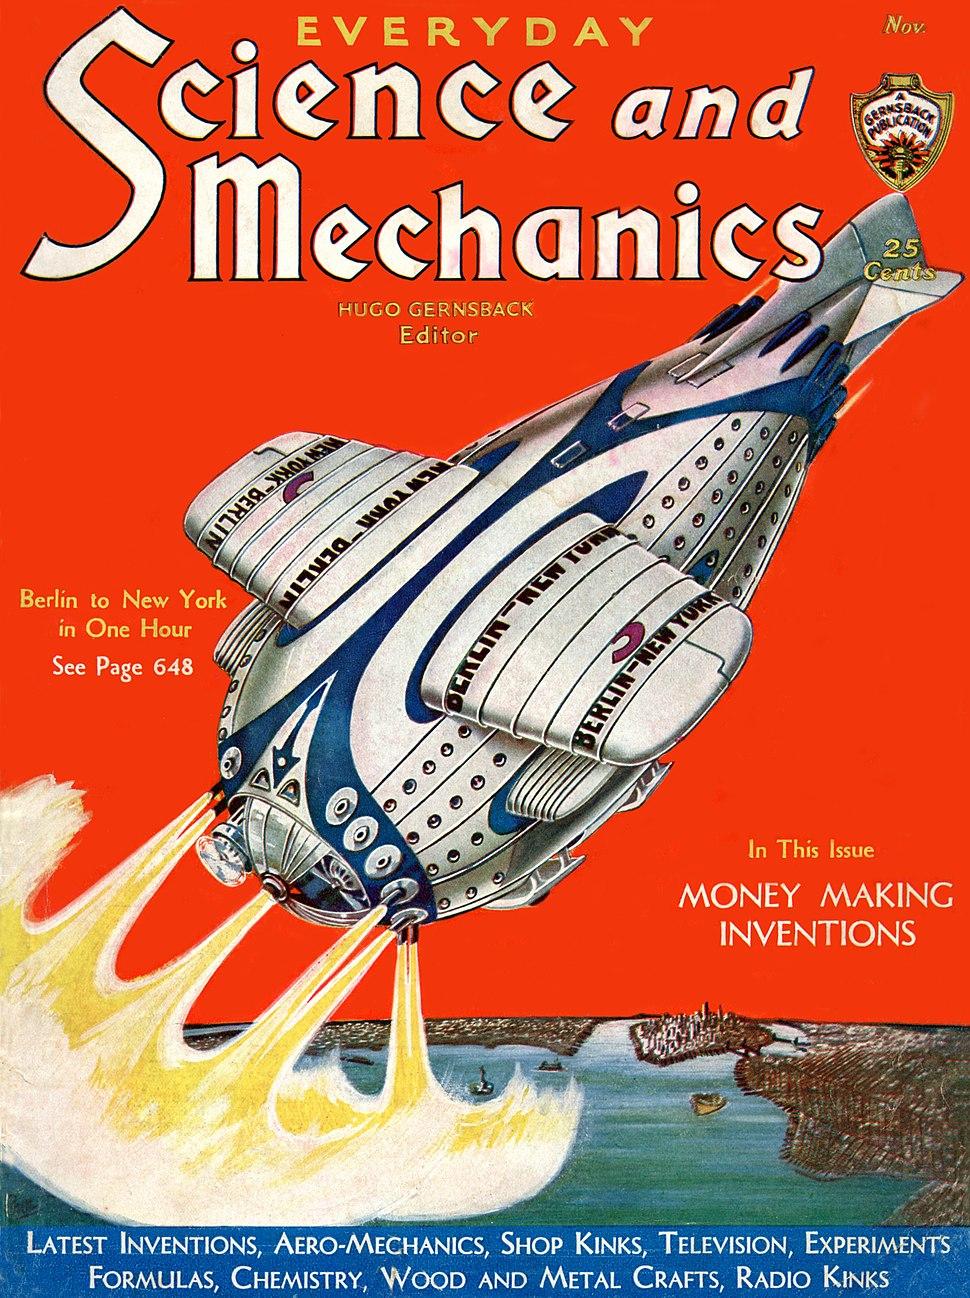 Science and Mechanics Nov 1931 cover